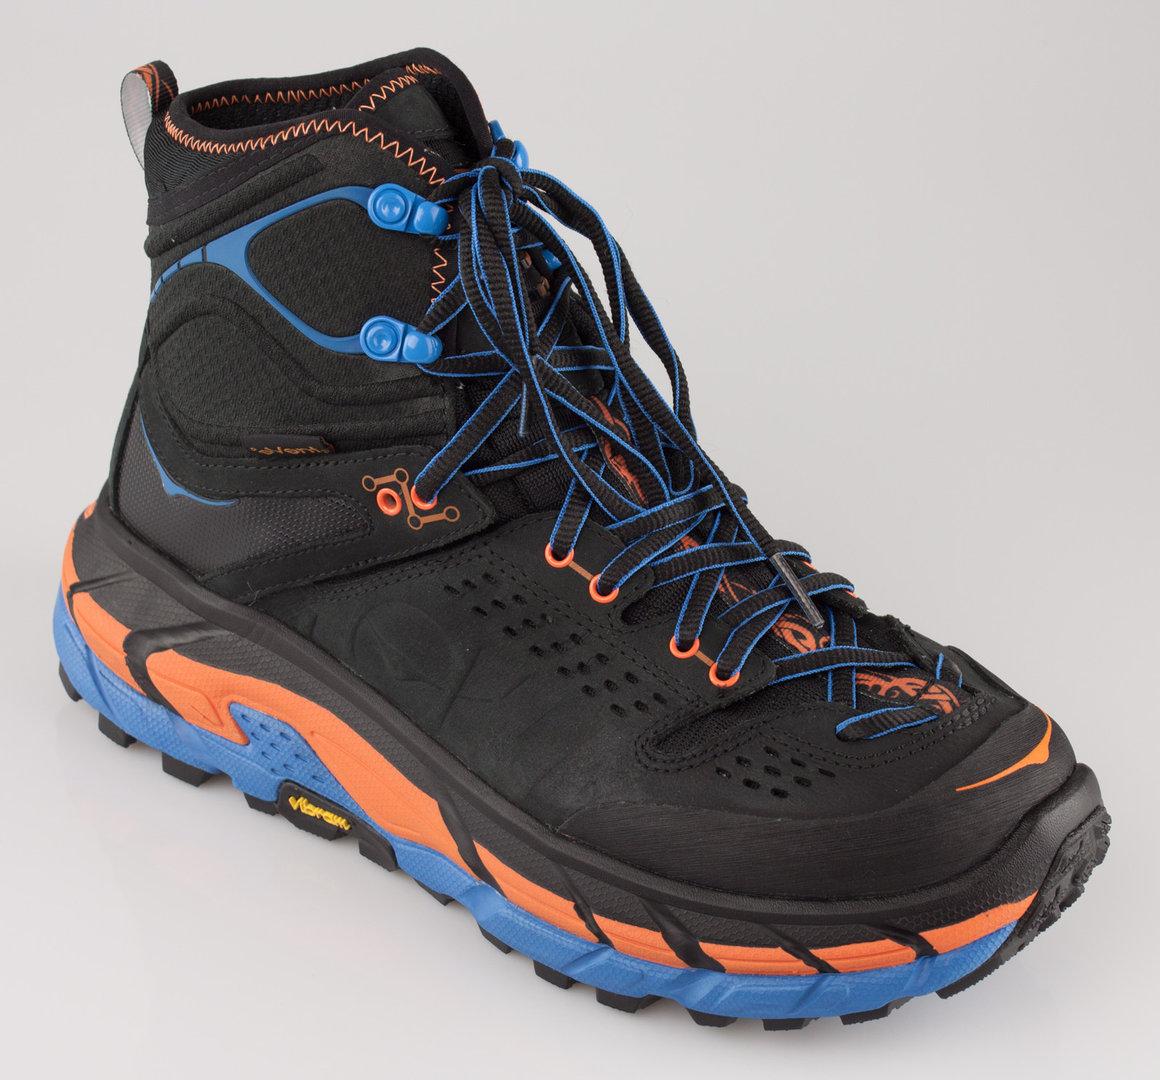 big sale 4c2b7 32b26 HOKA ONE ONE 1008334 TOR ULTRA HI WP trekking boots WP anthracite/orange  clownfish